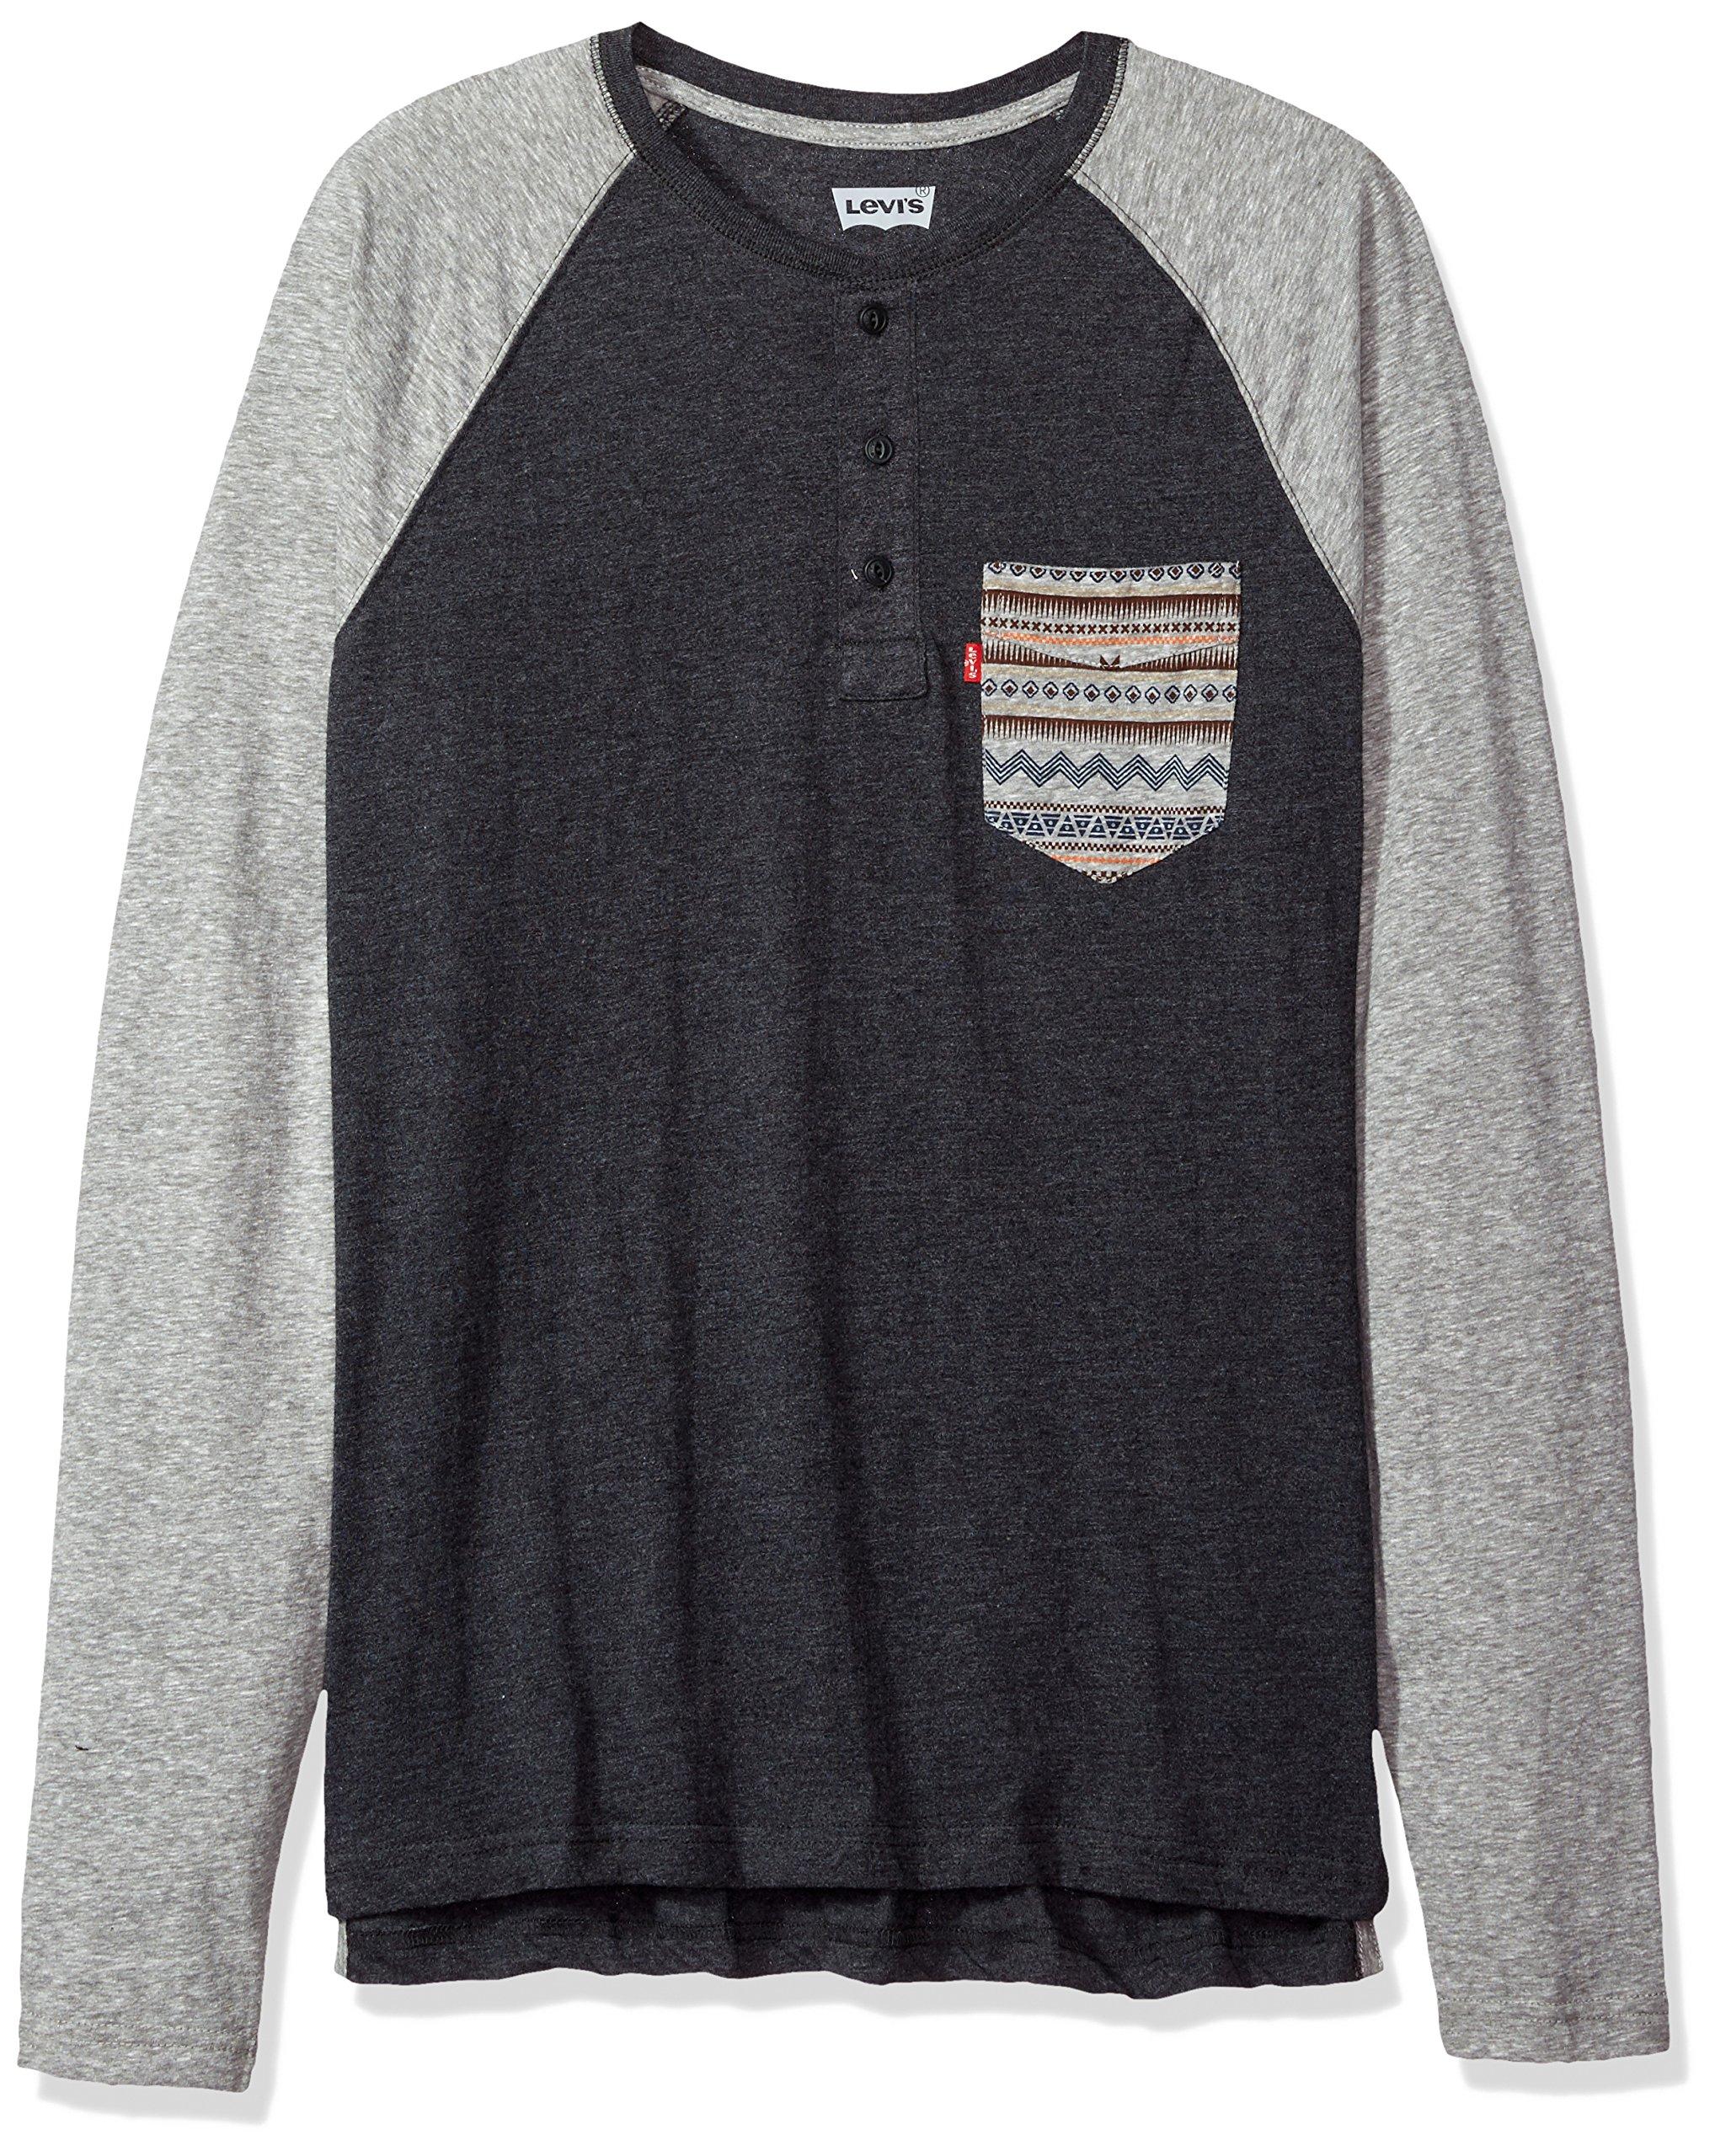 Levi's Men's Chabot Long Sleeve Snow Jersey Shirt, Caviar/Castlerock, Medium